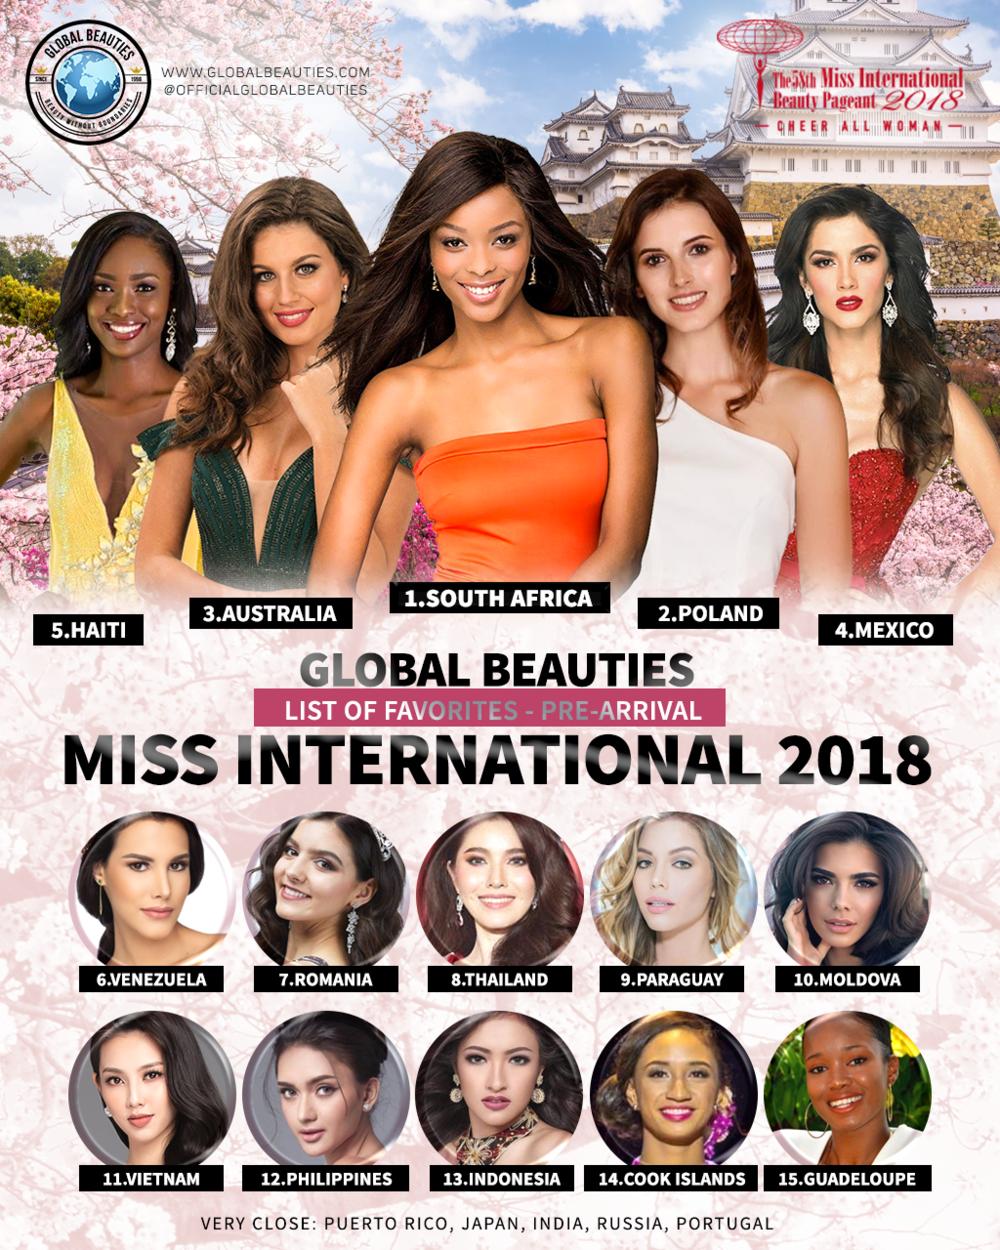 miss international .png